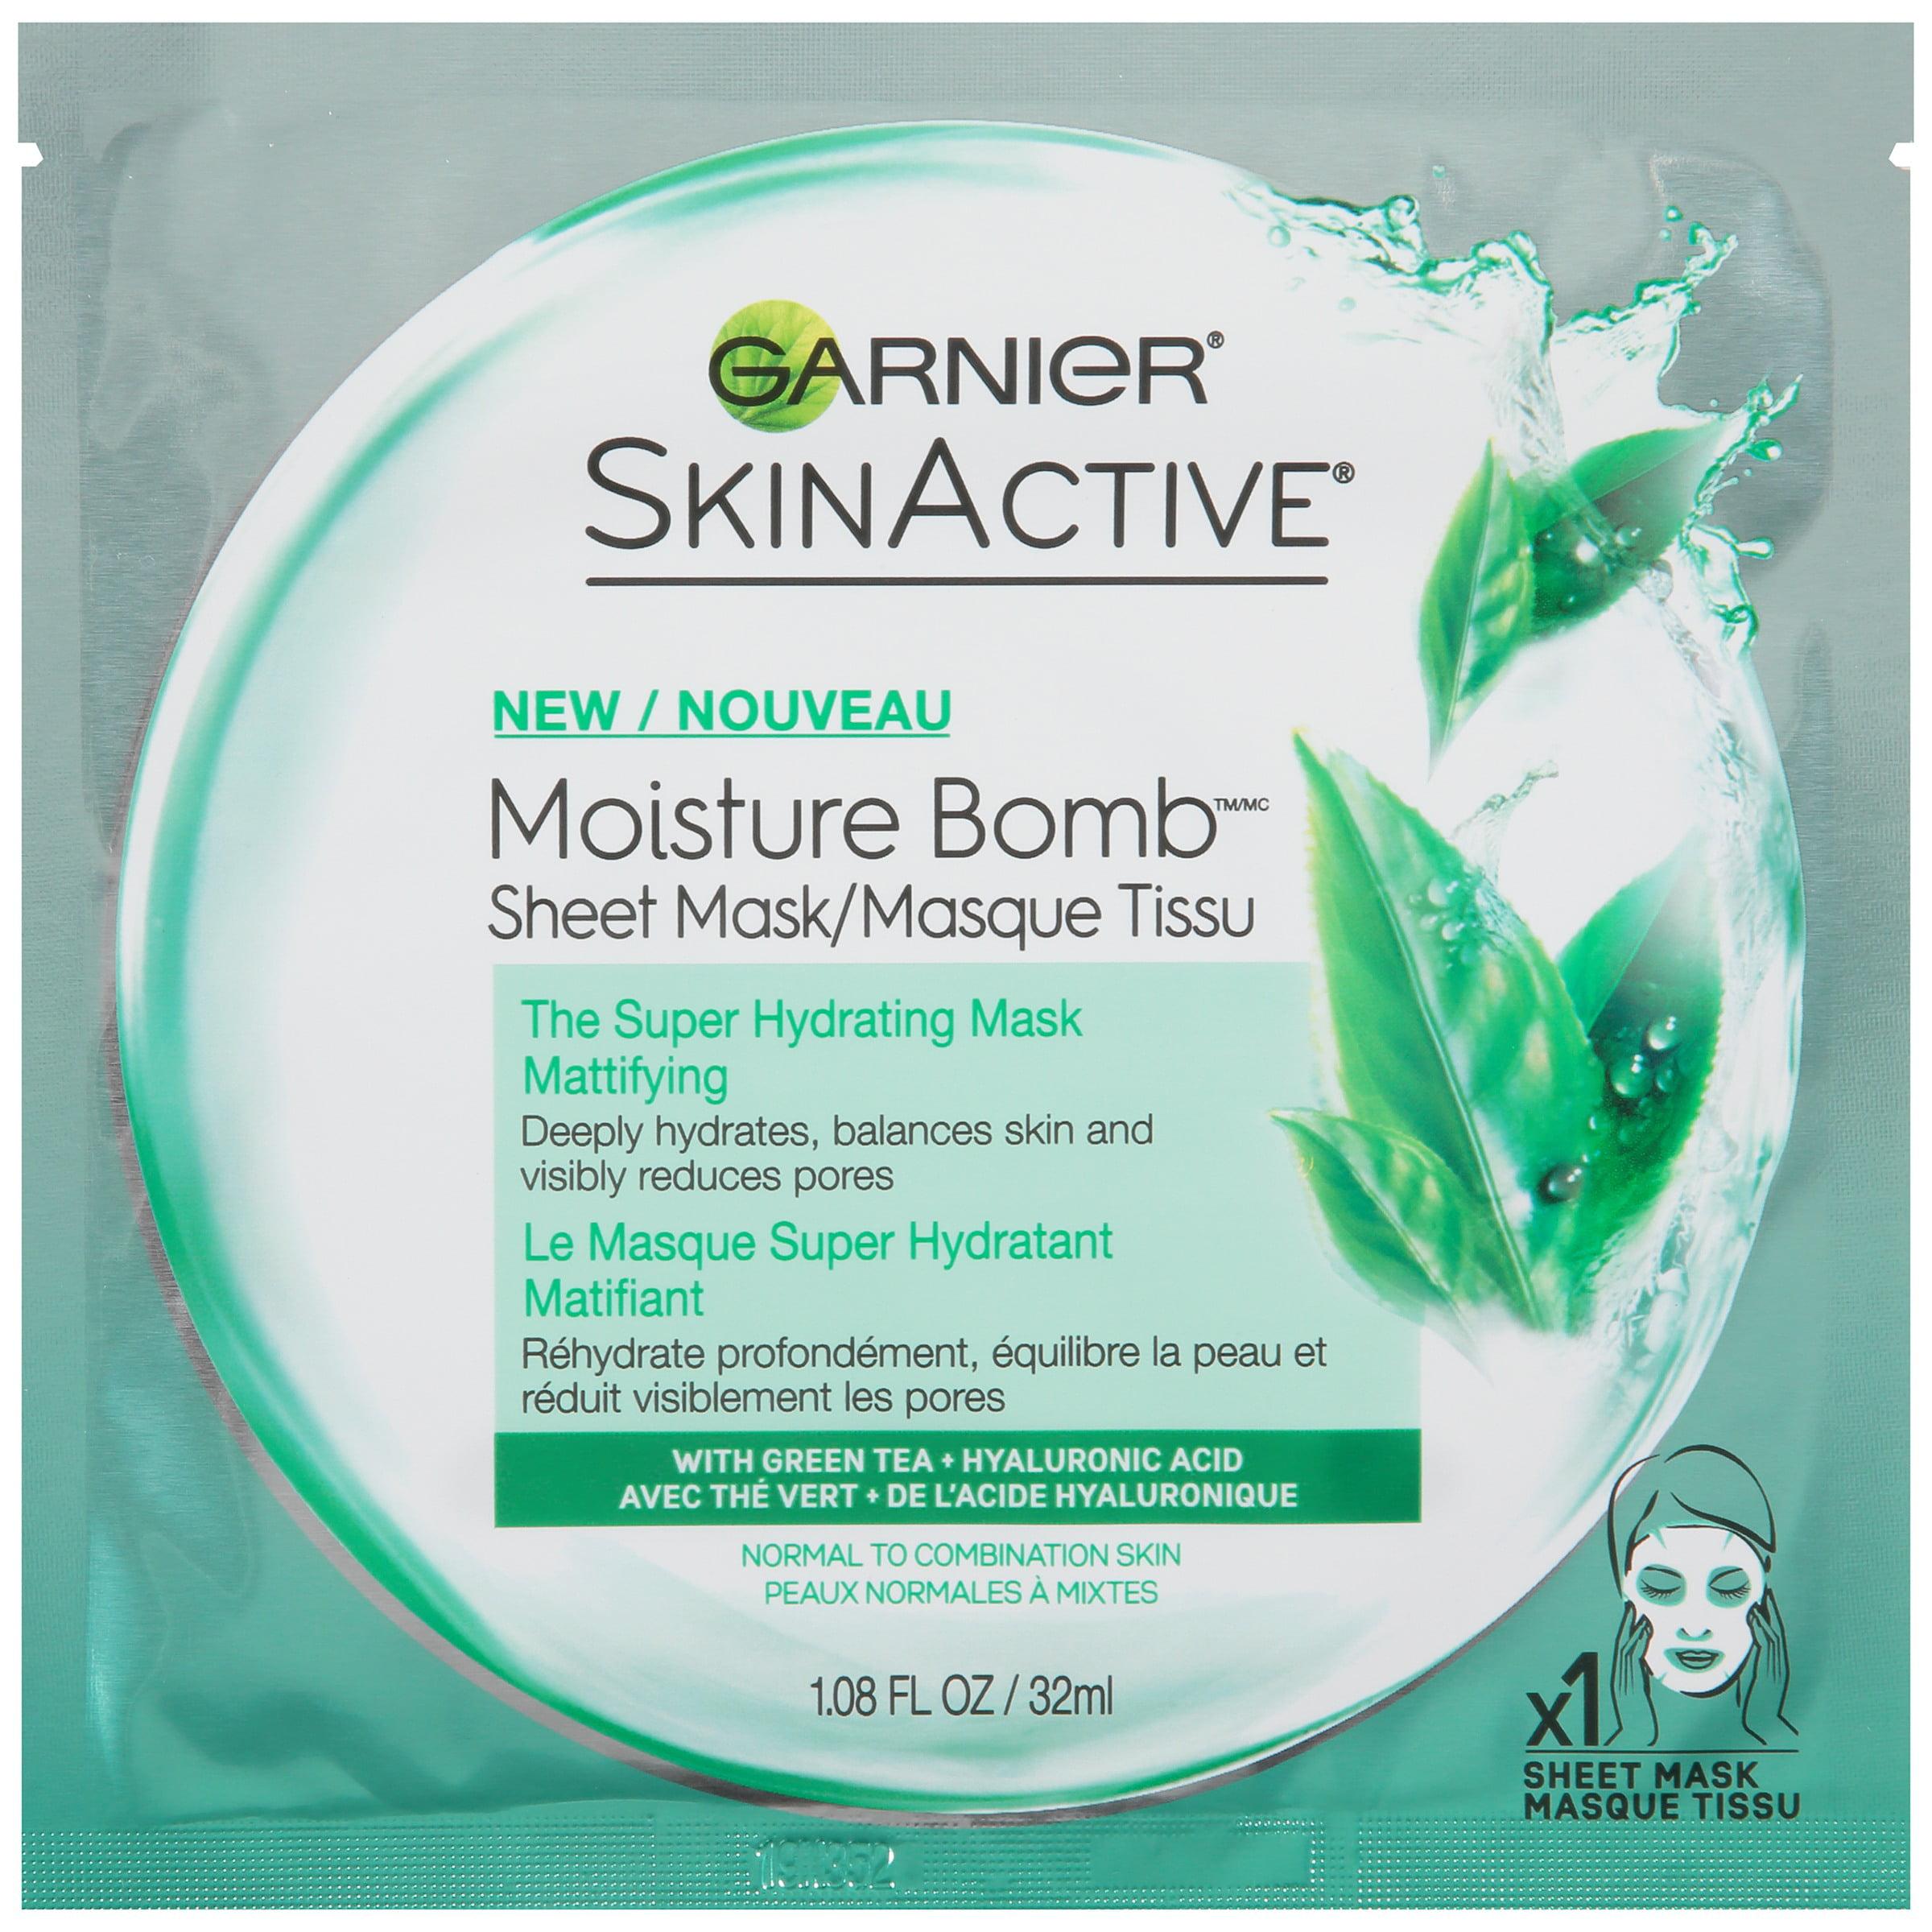 Garnier SkinActive Moisture Bomb Mattifying Sheet Mask 1.08 fl. oz. Pack